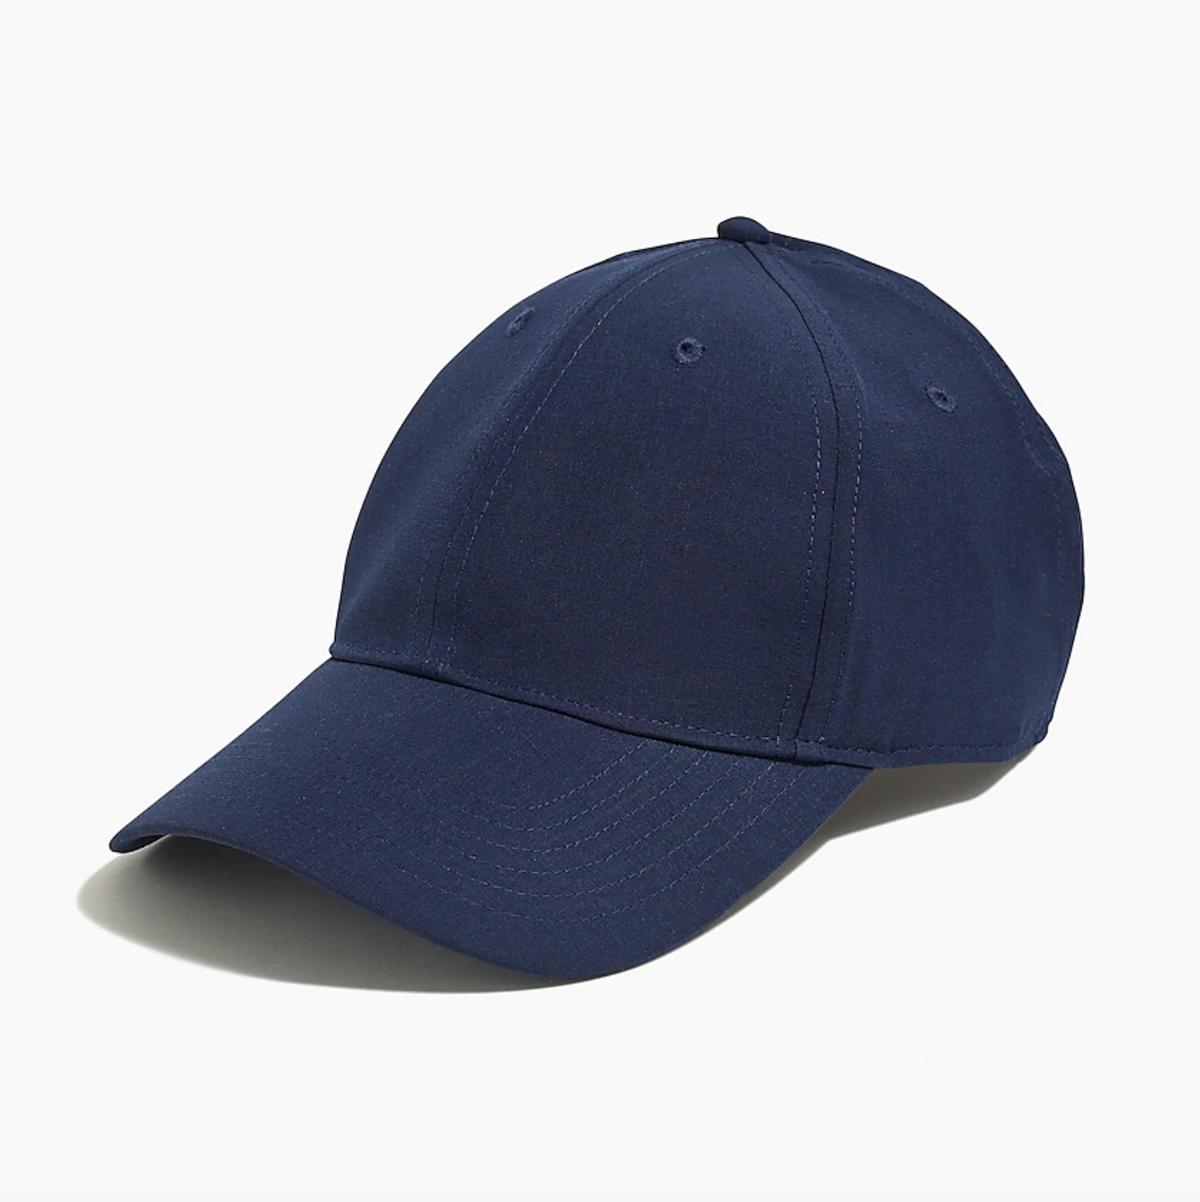 j.crew performance baseball cap